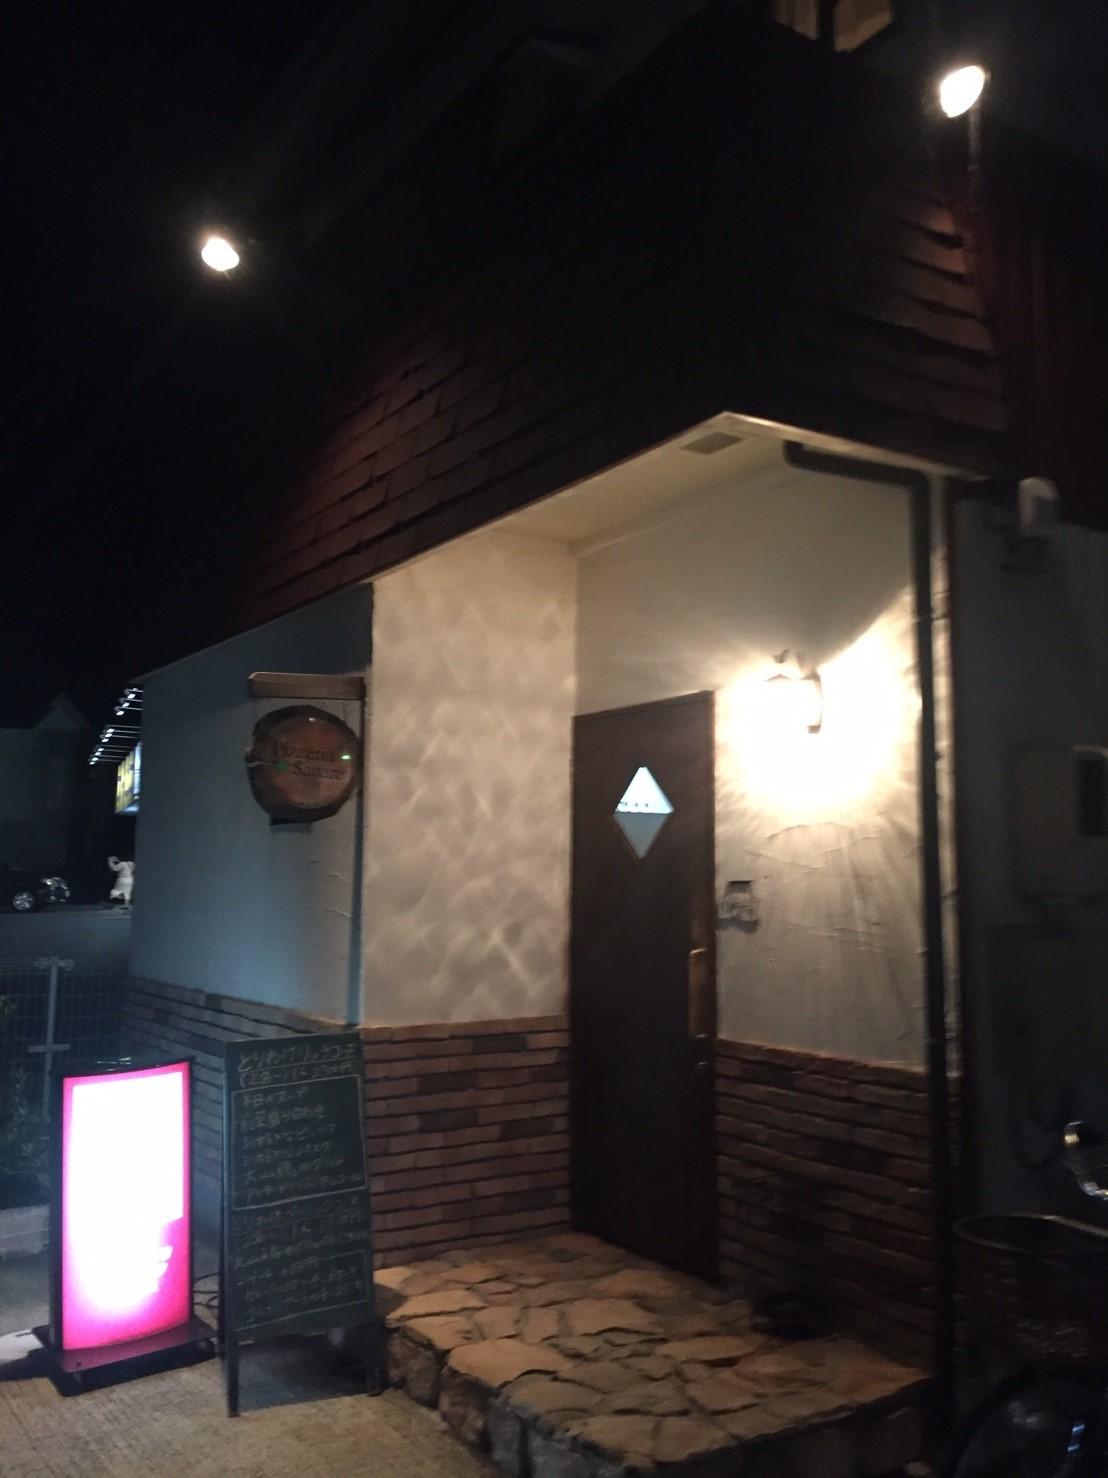 Pizzeria Sanare 取り分けディナー_e0115904_05034445.jpg